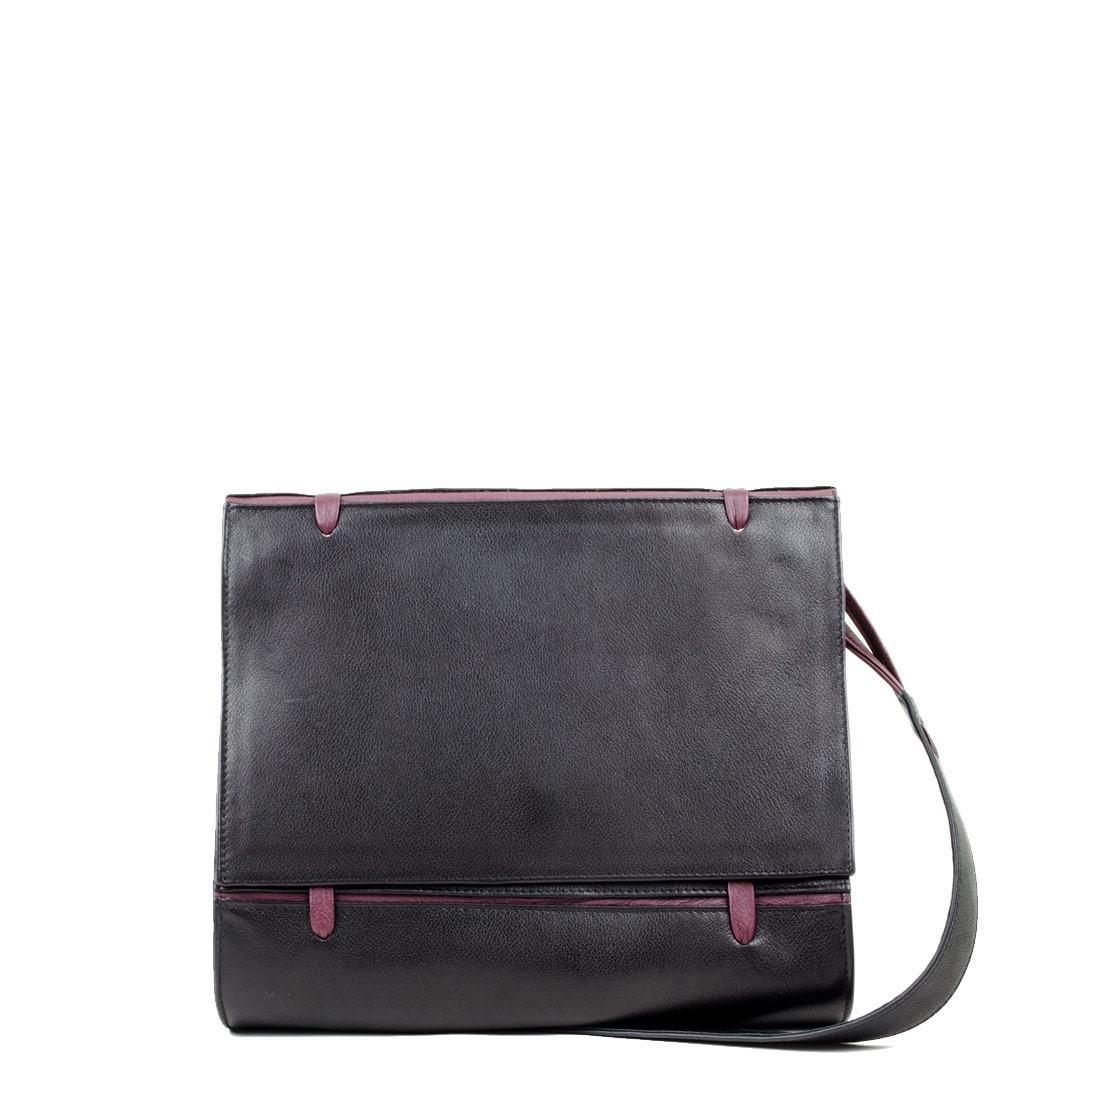 Elsa Black Leather Across Body Bag